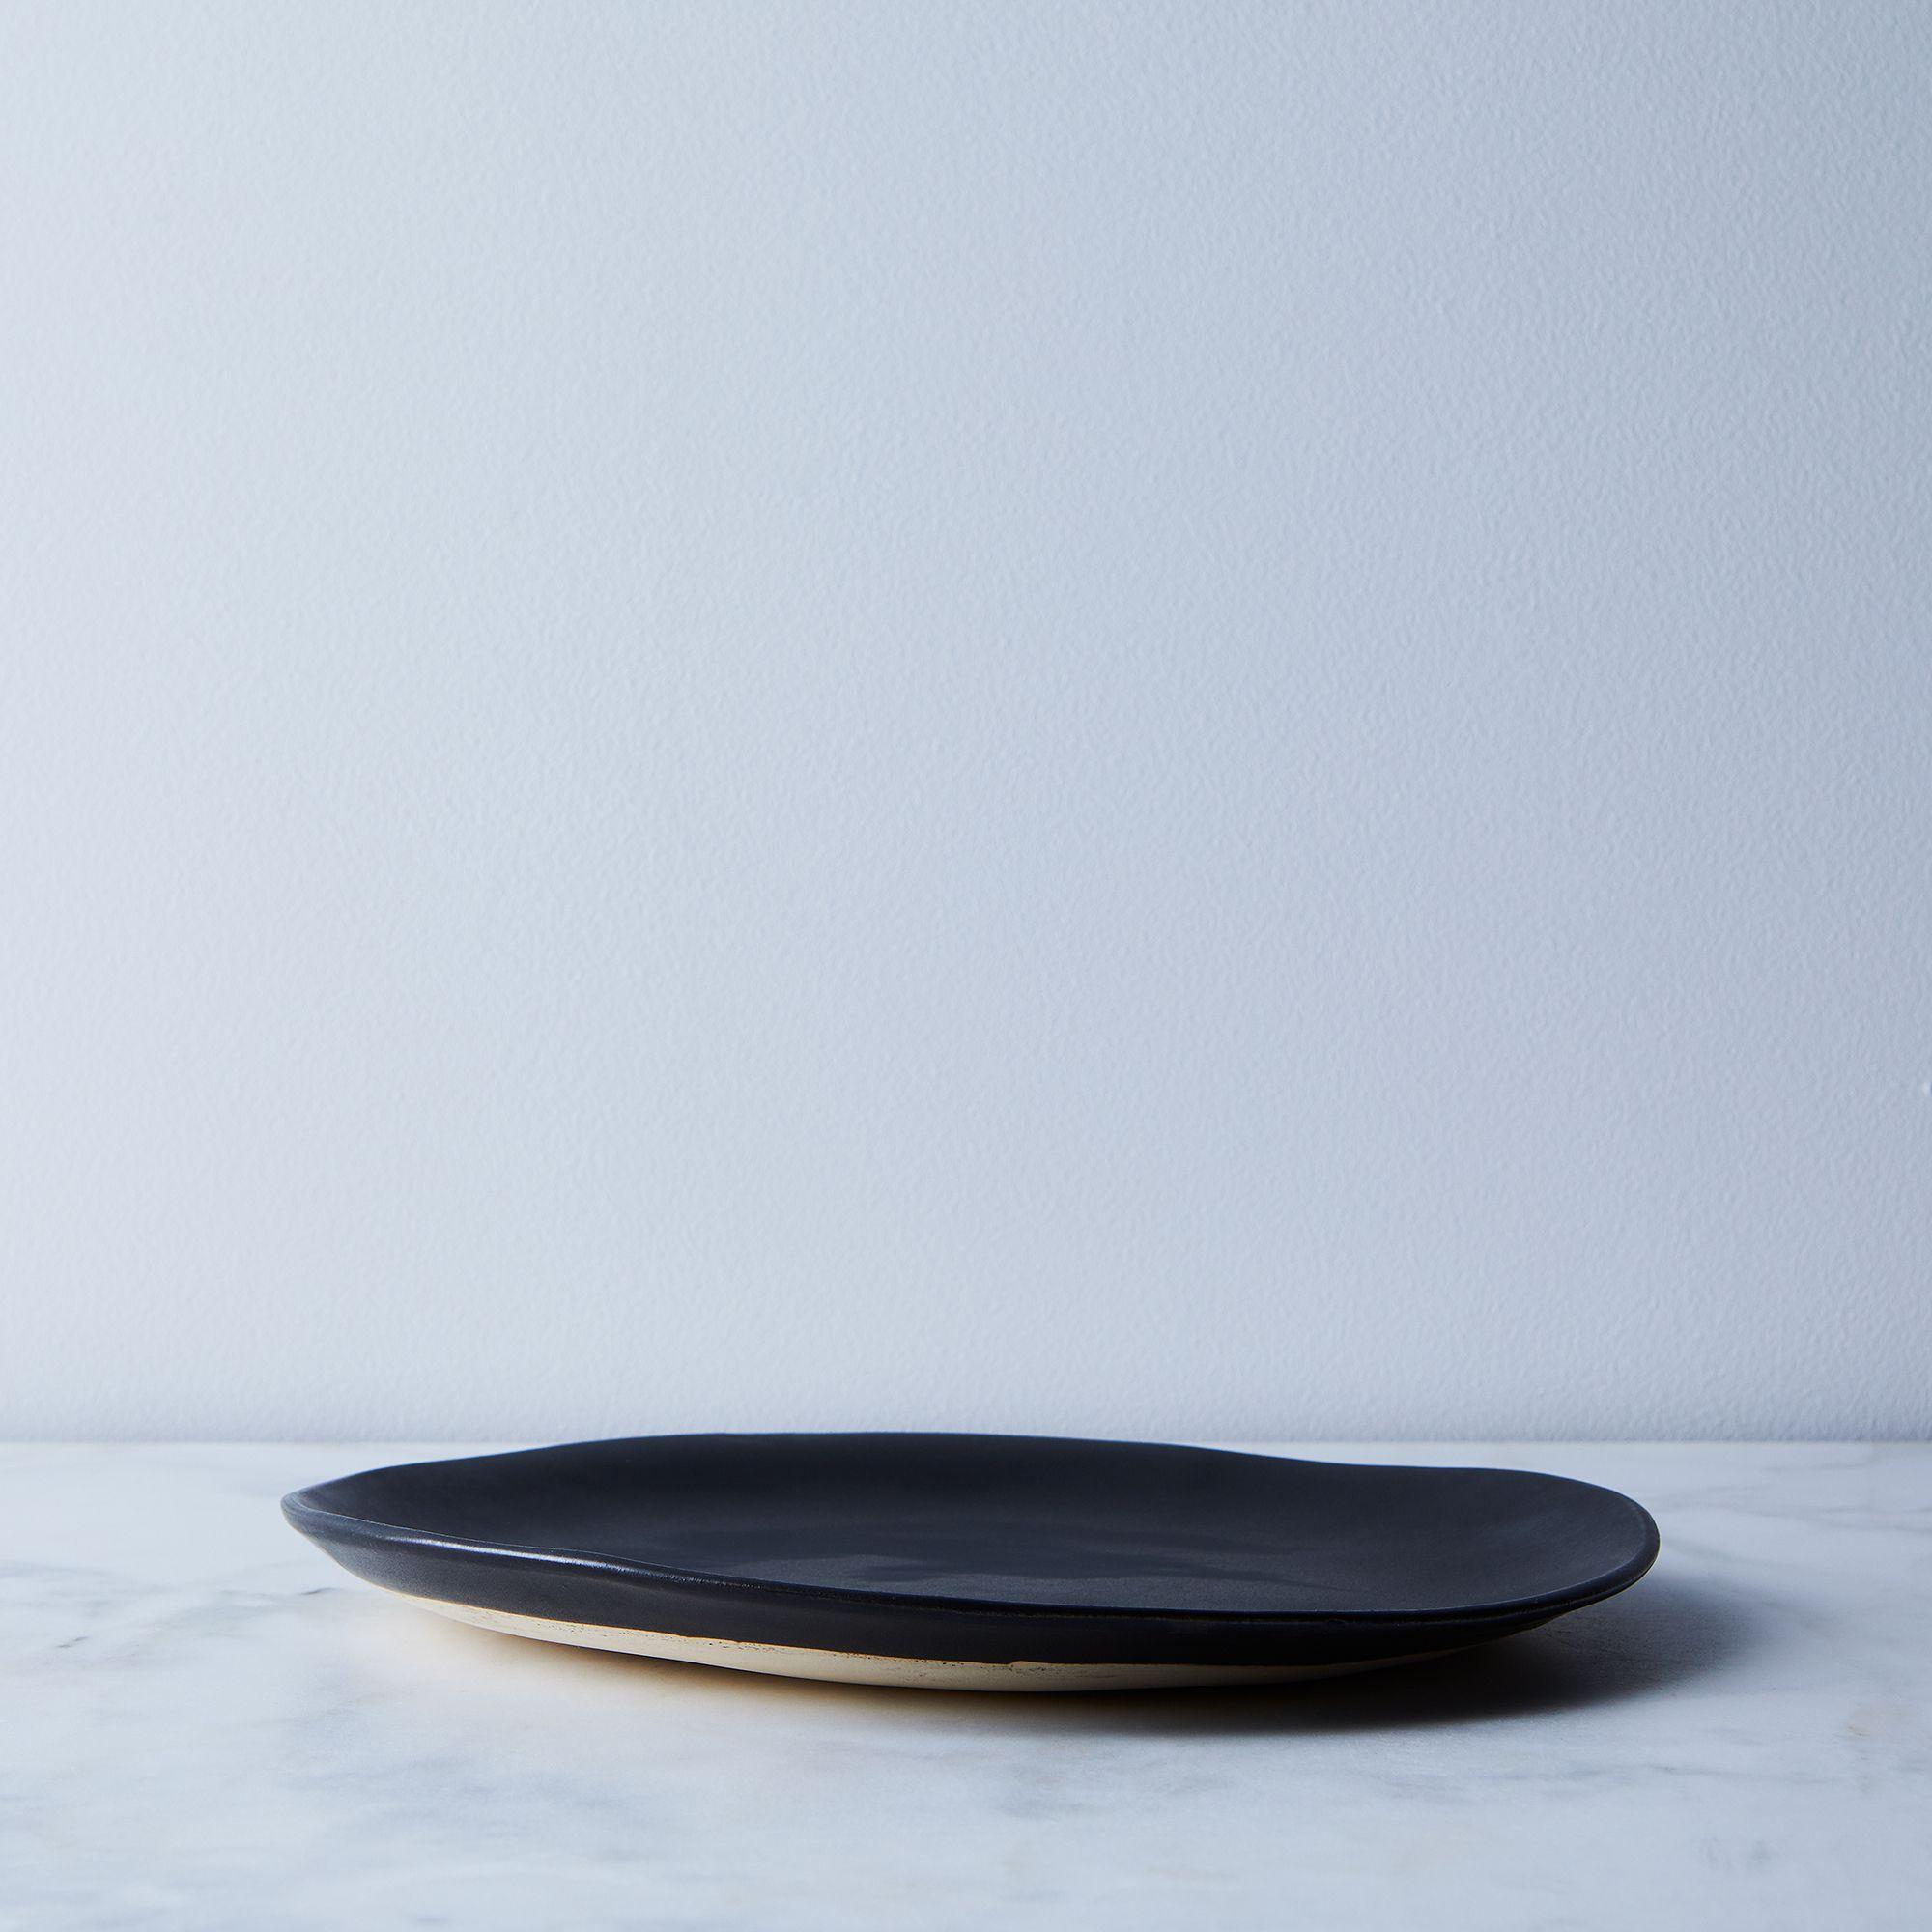 My Dream Kitchen by Renee Kolecki